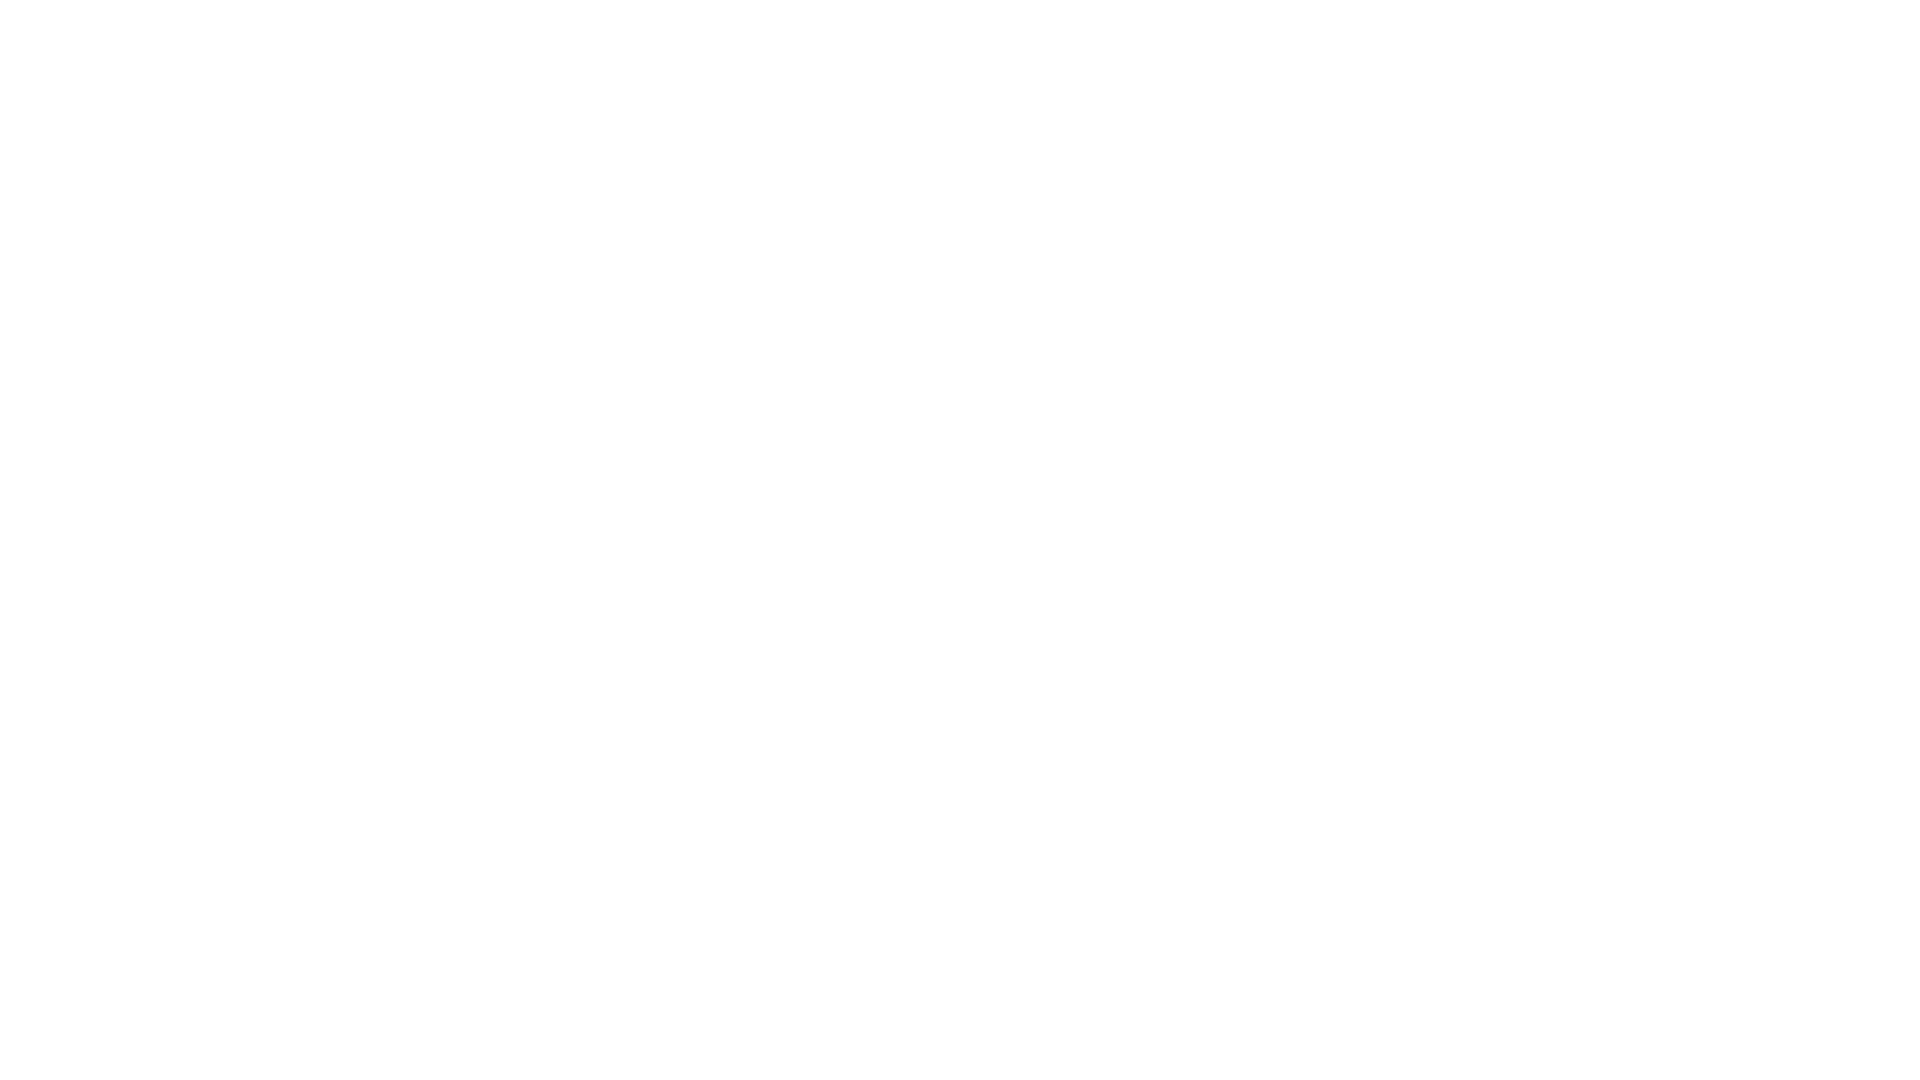 Artesis Plantijn